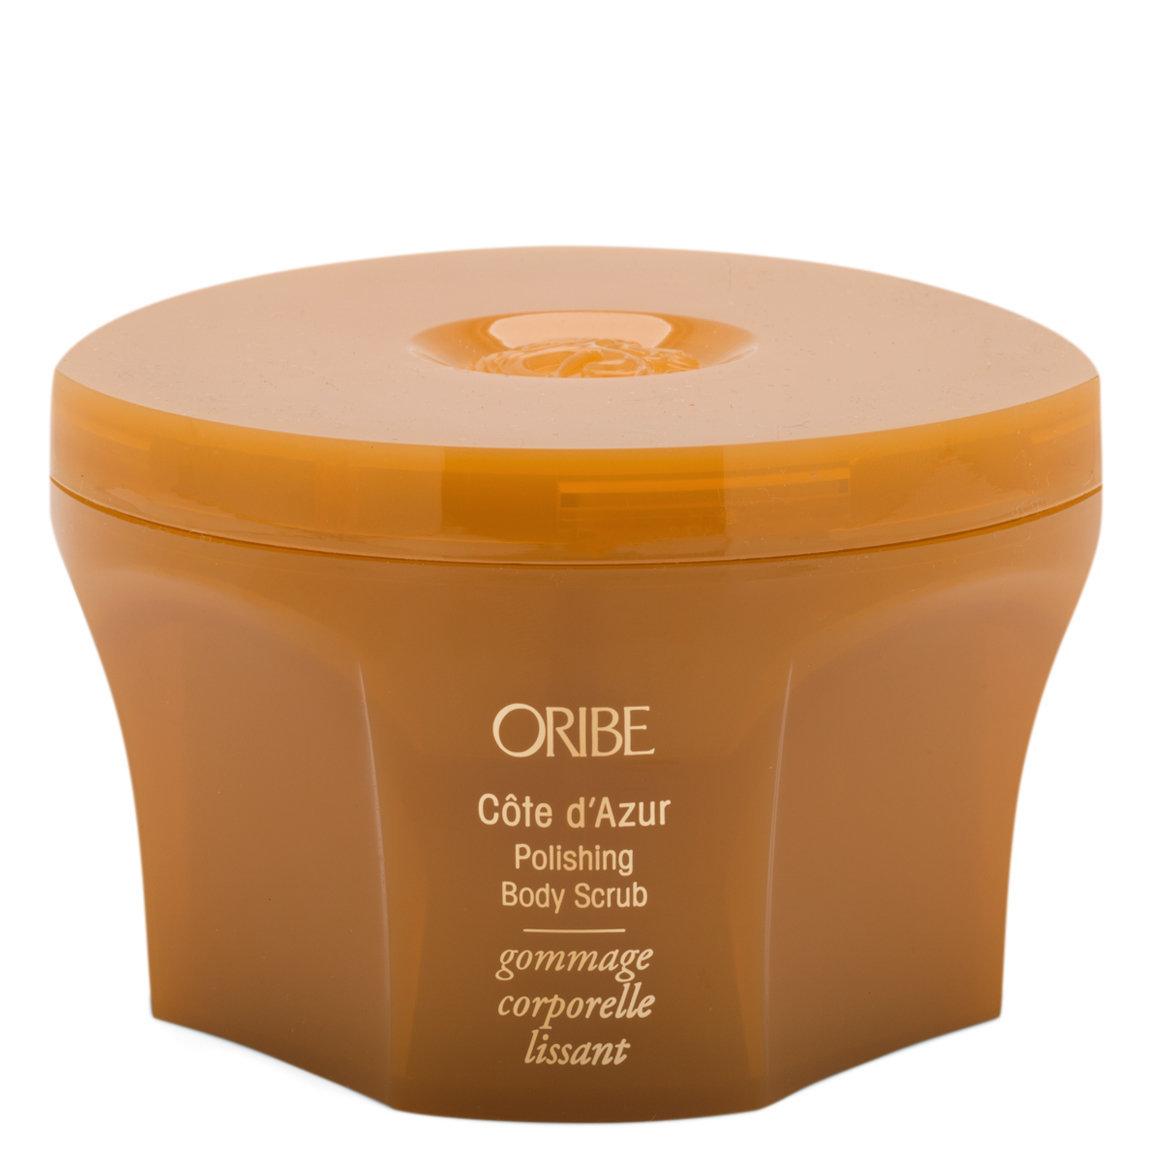 Oribe Côte d'Azur Polishing Body Scrub product swatch.